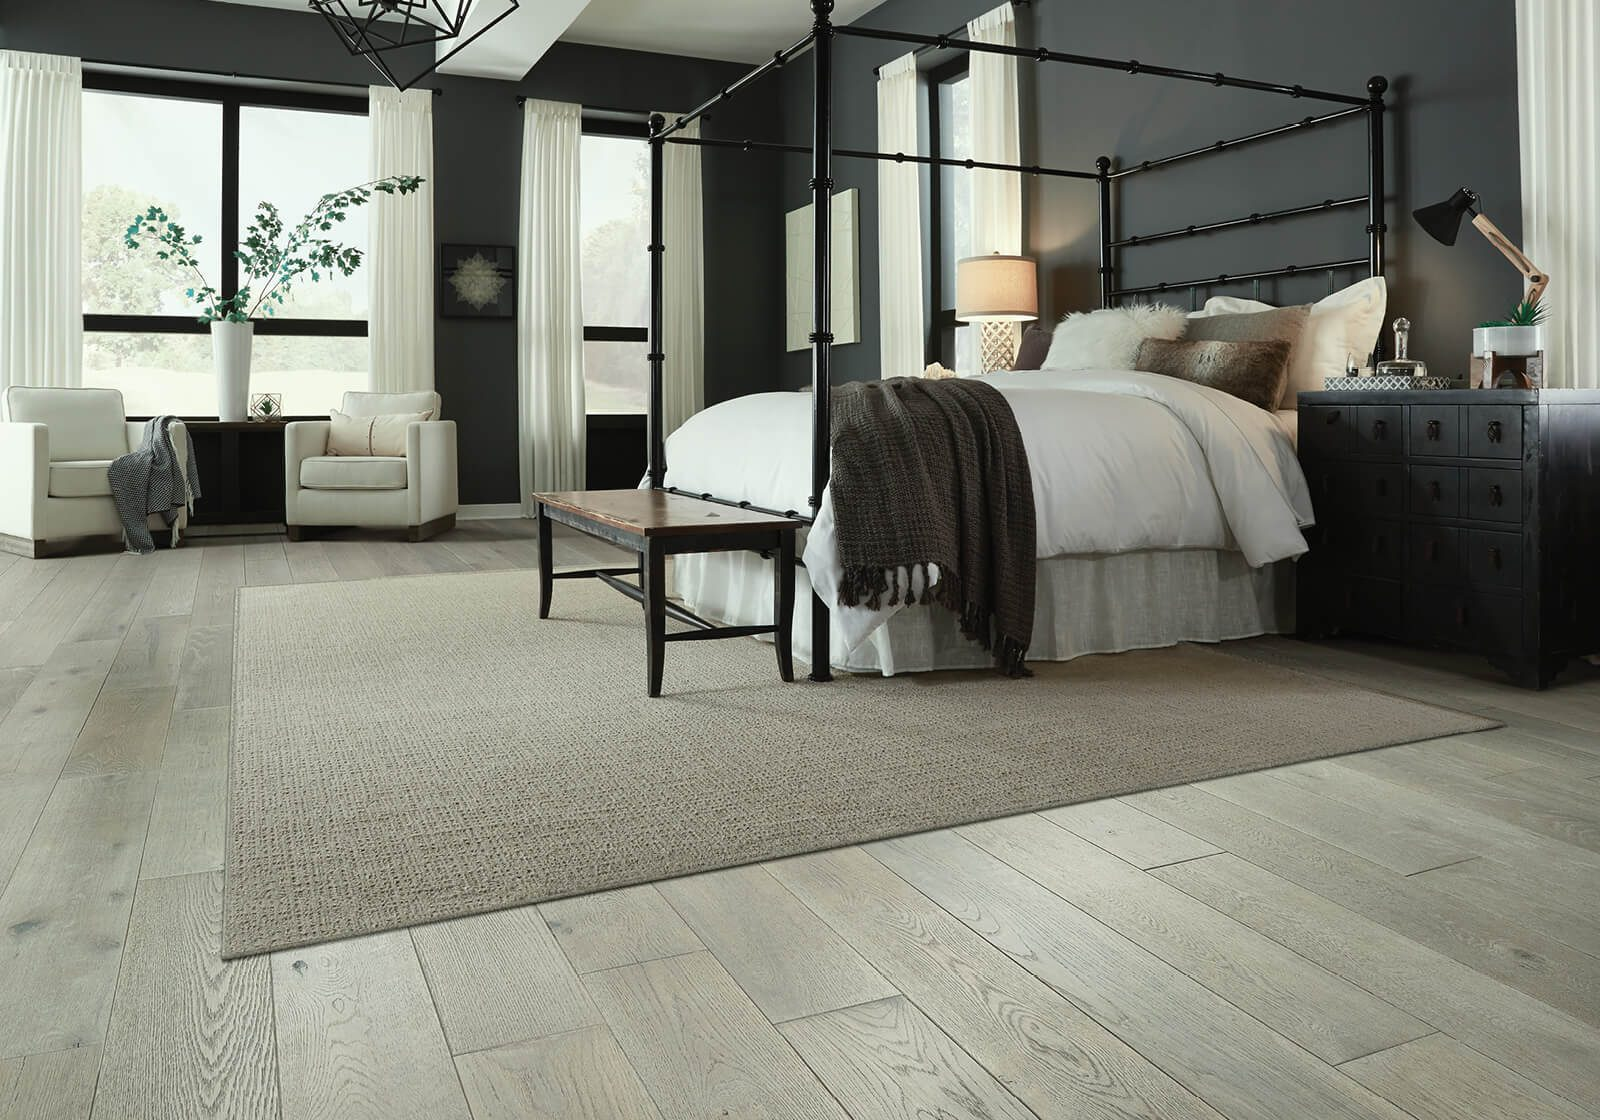 custom area rug in bedroom | Shoreline Flooring